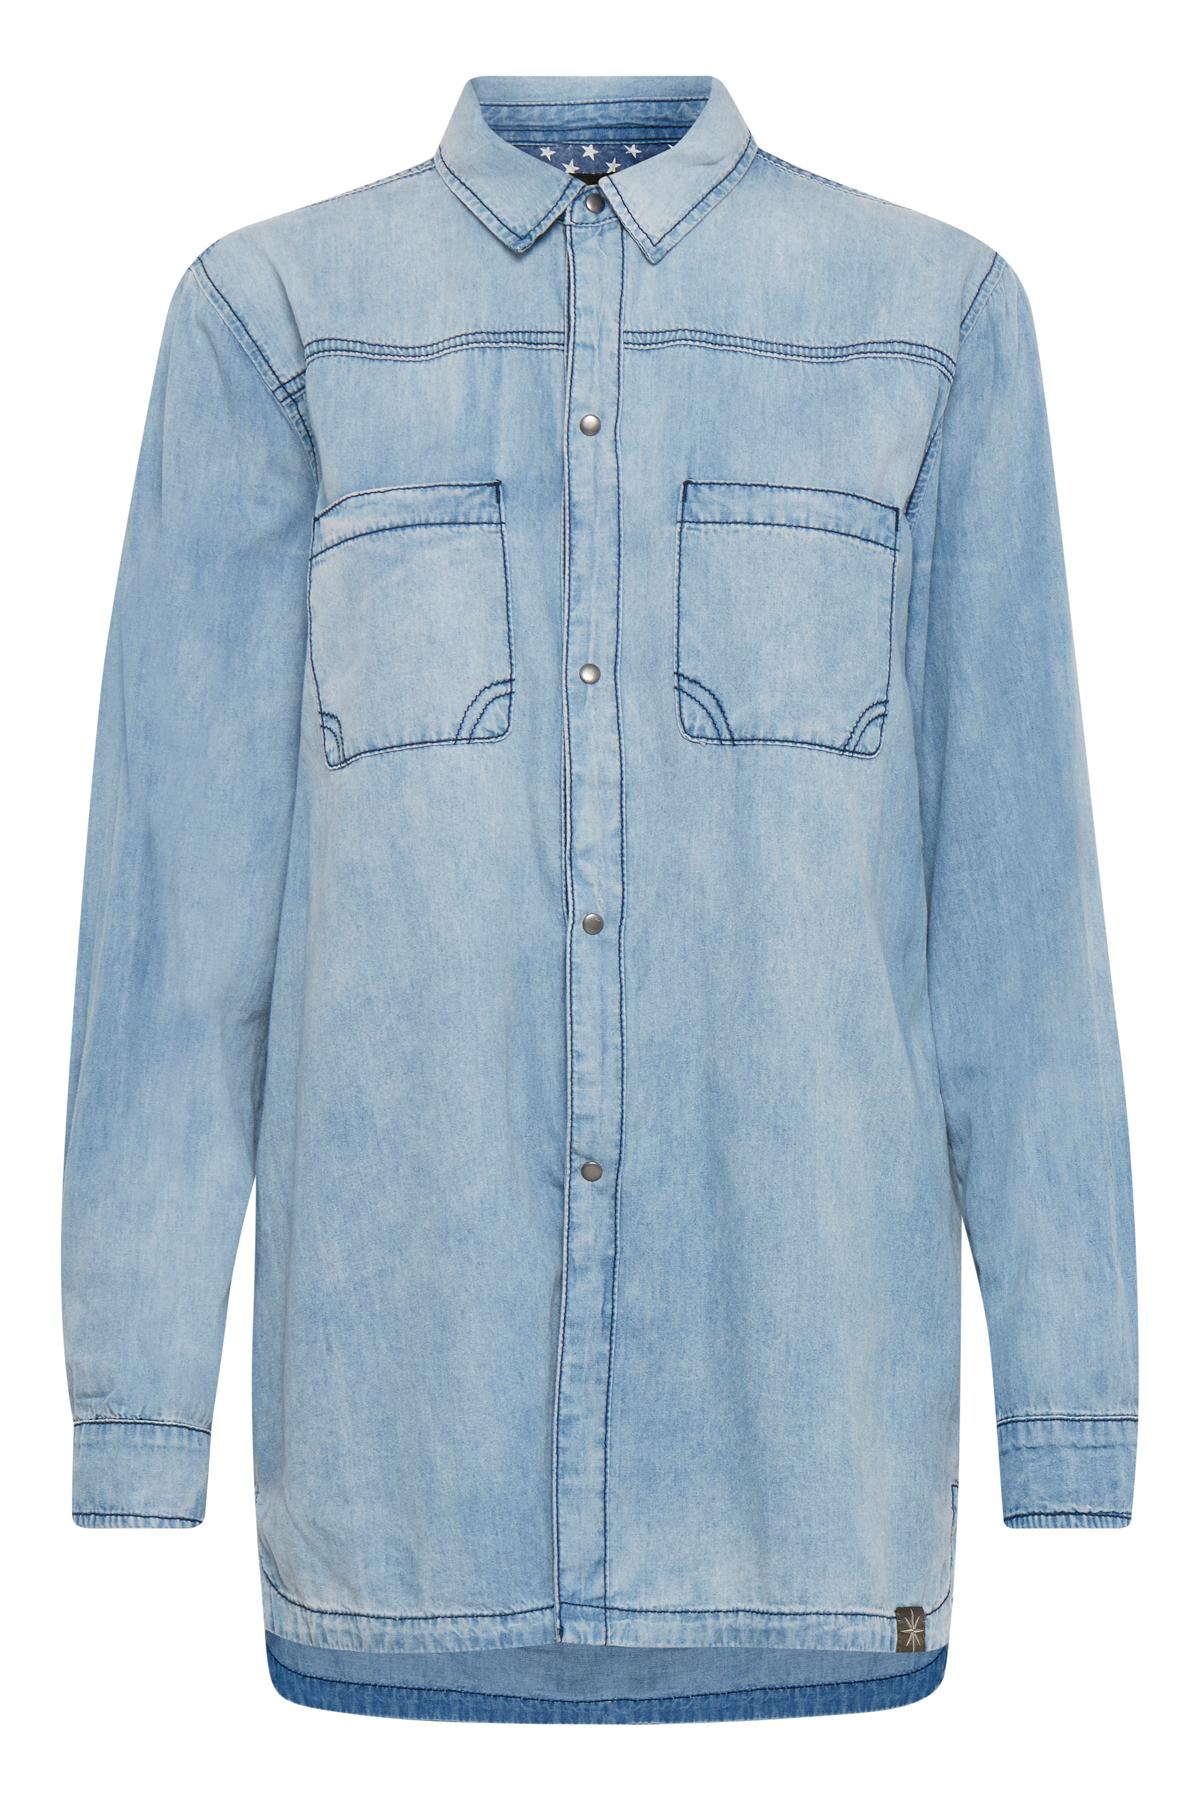 Image of Pulz Jeans Dame Lækker Louisa skjorte - Lys denimblå